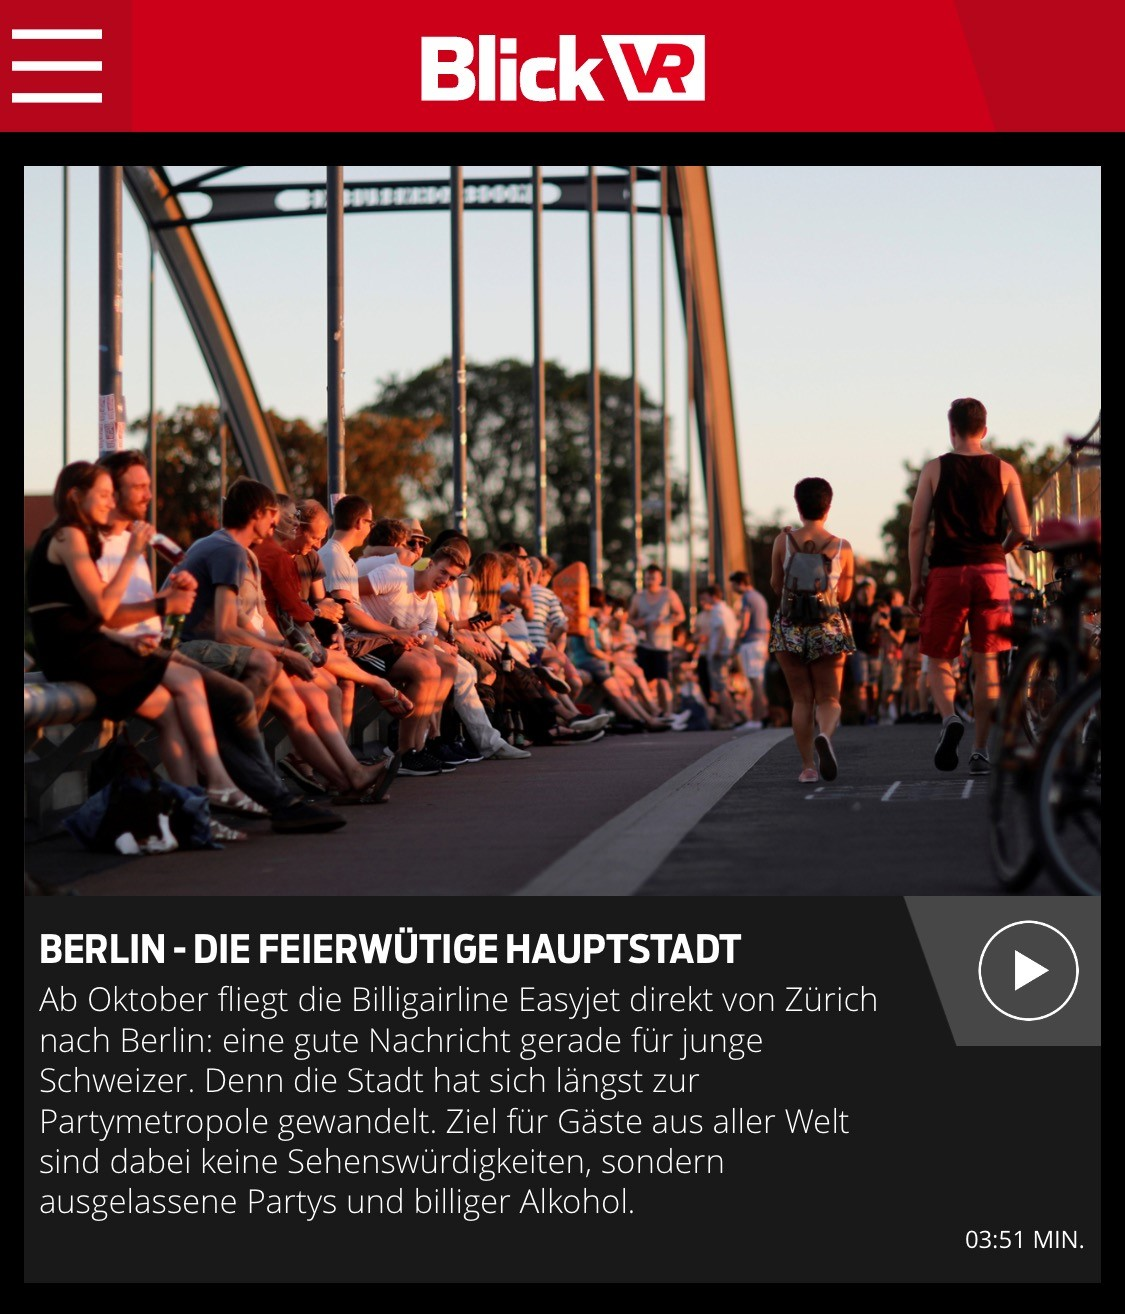 blickvr_berlin_tourismus_intovr